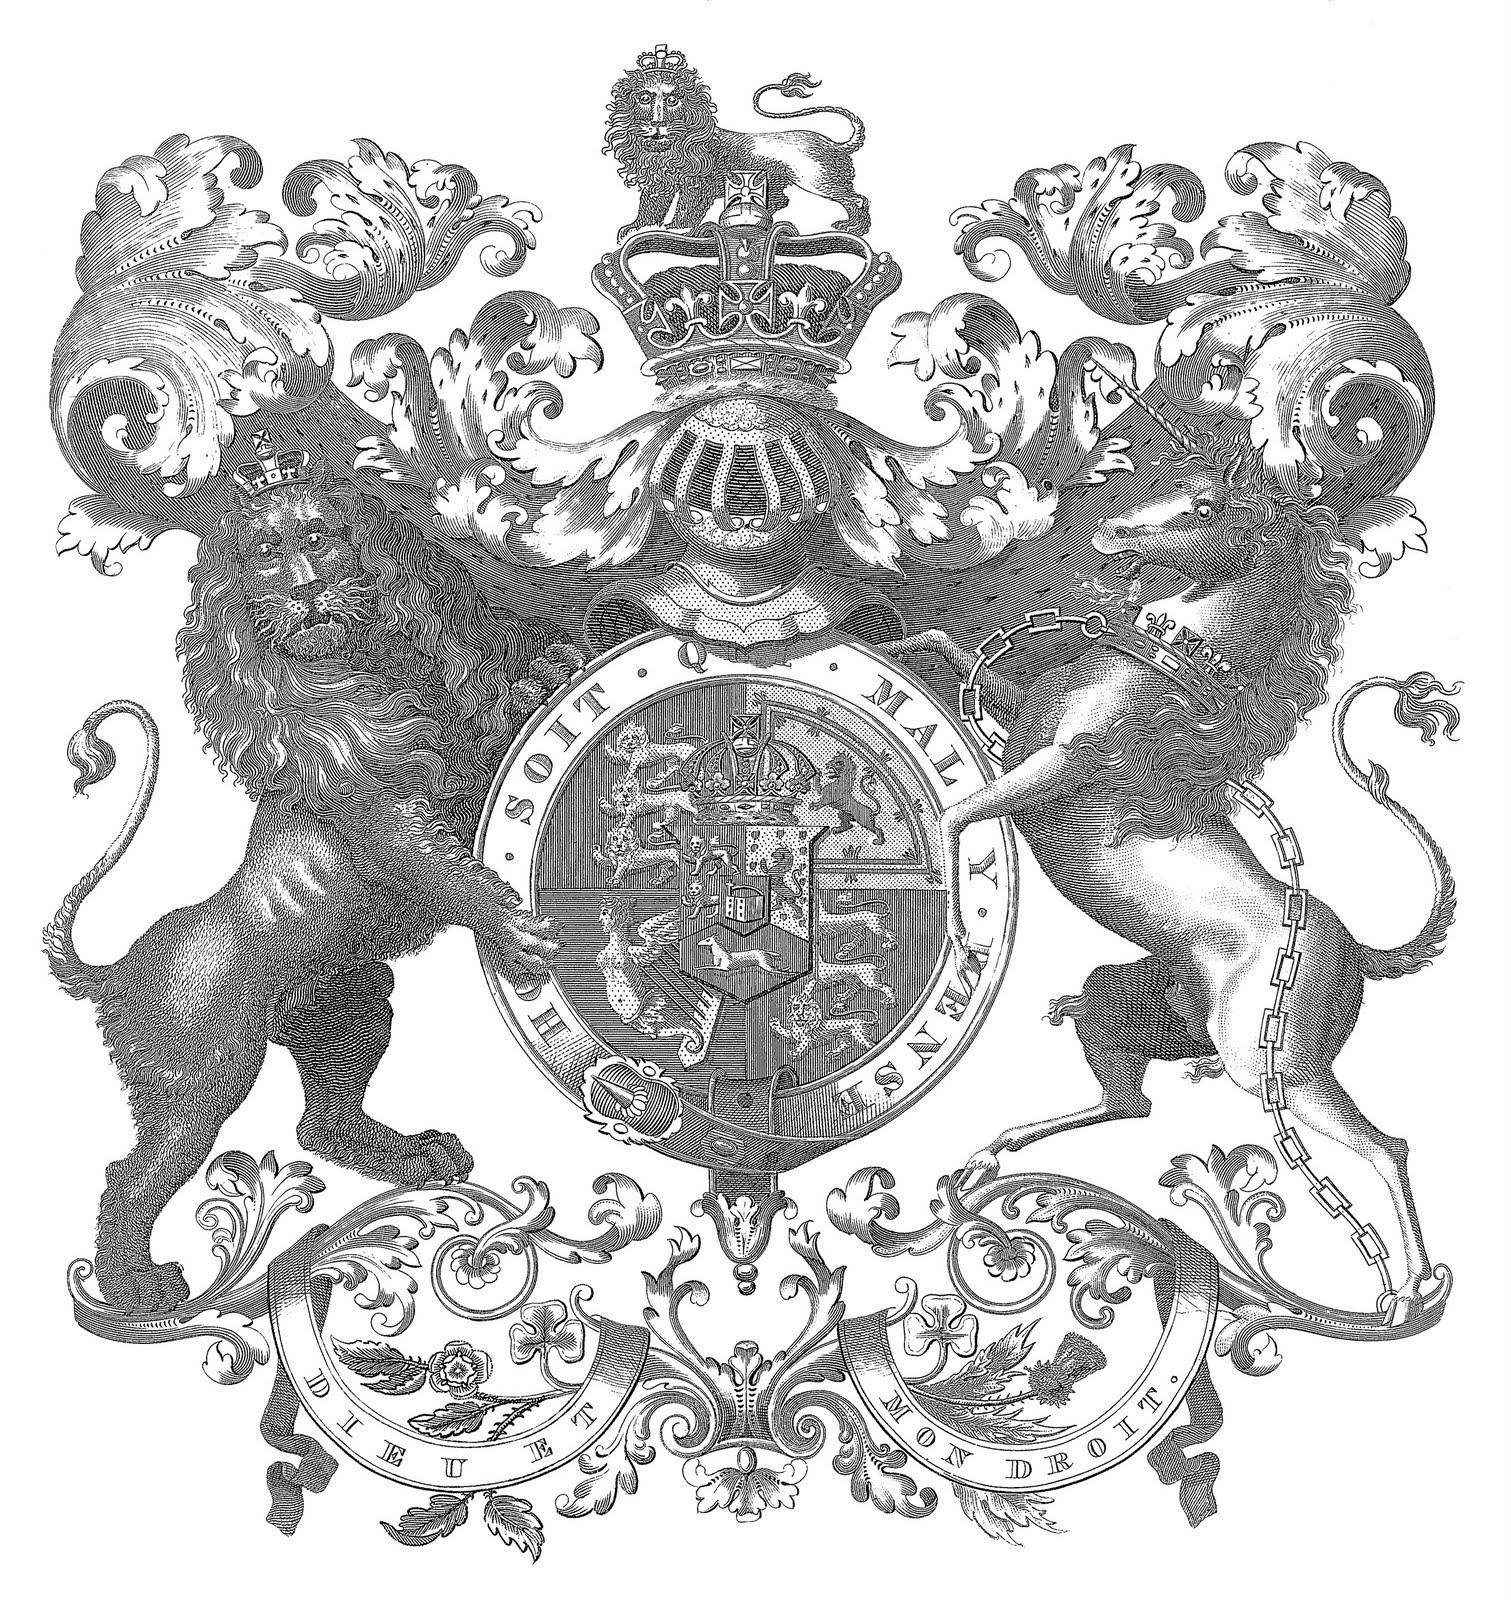 сюда фото тарелка с гербом лев и единооог Вас